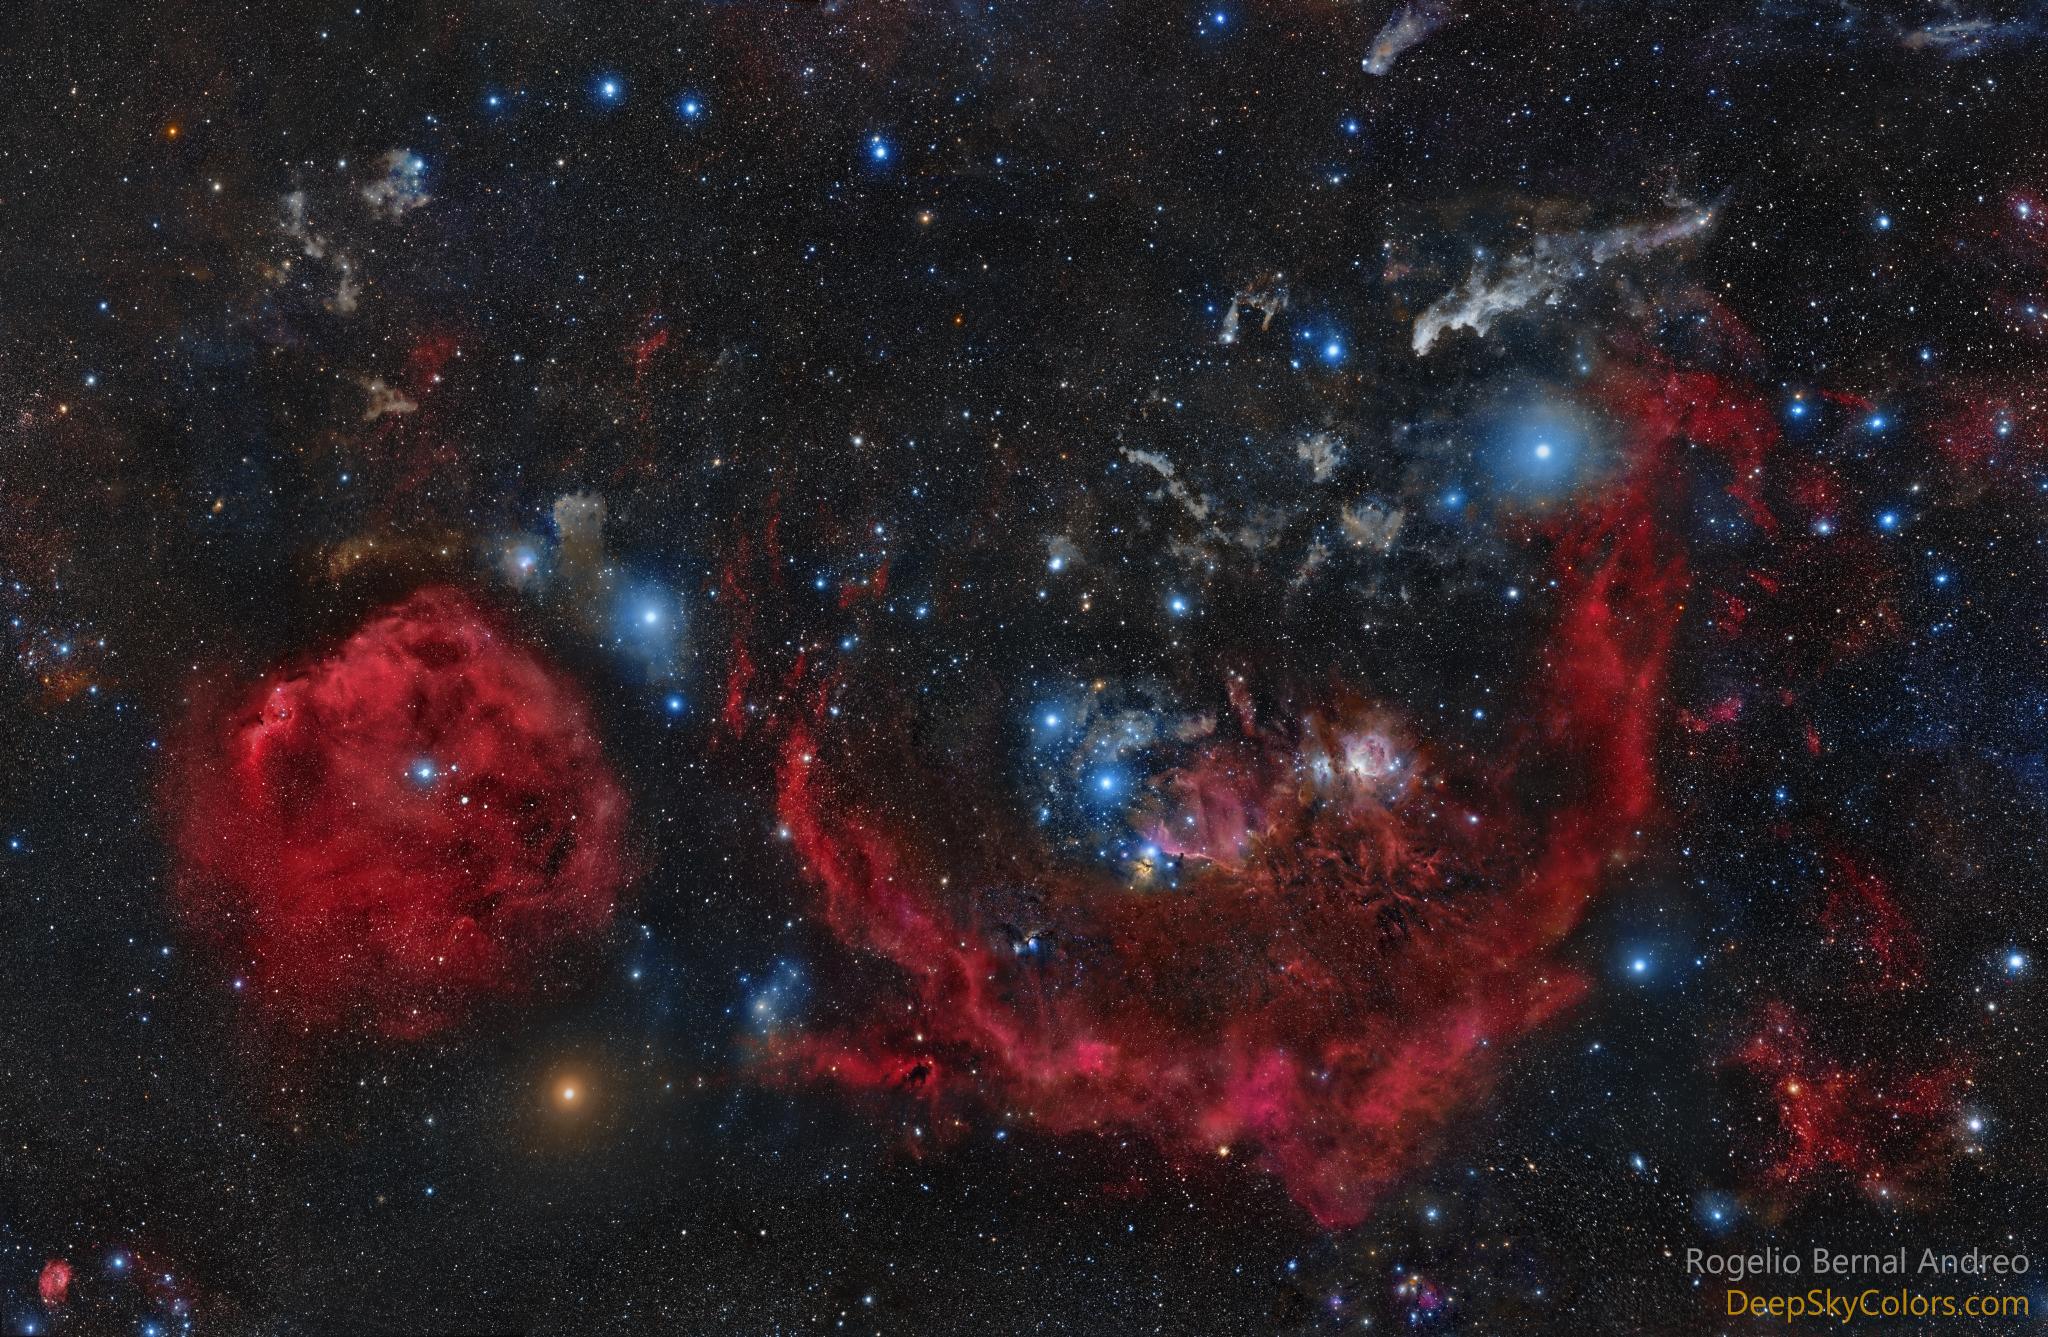 2016 December 4 - Official Star Names for Orion